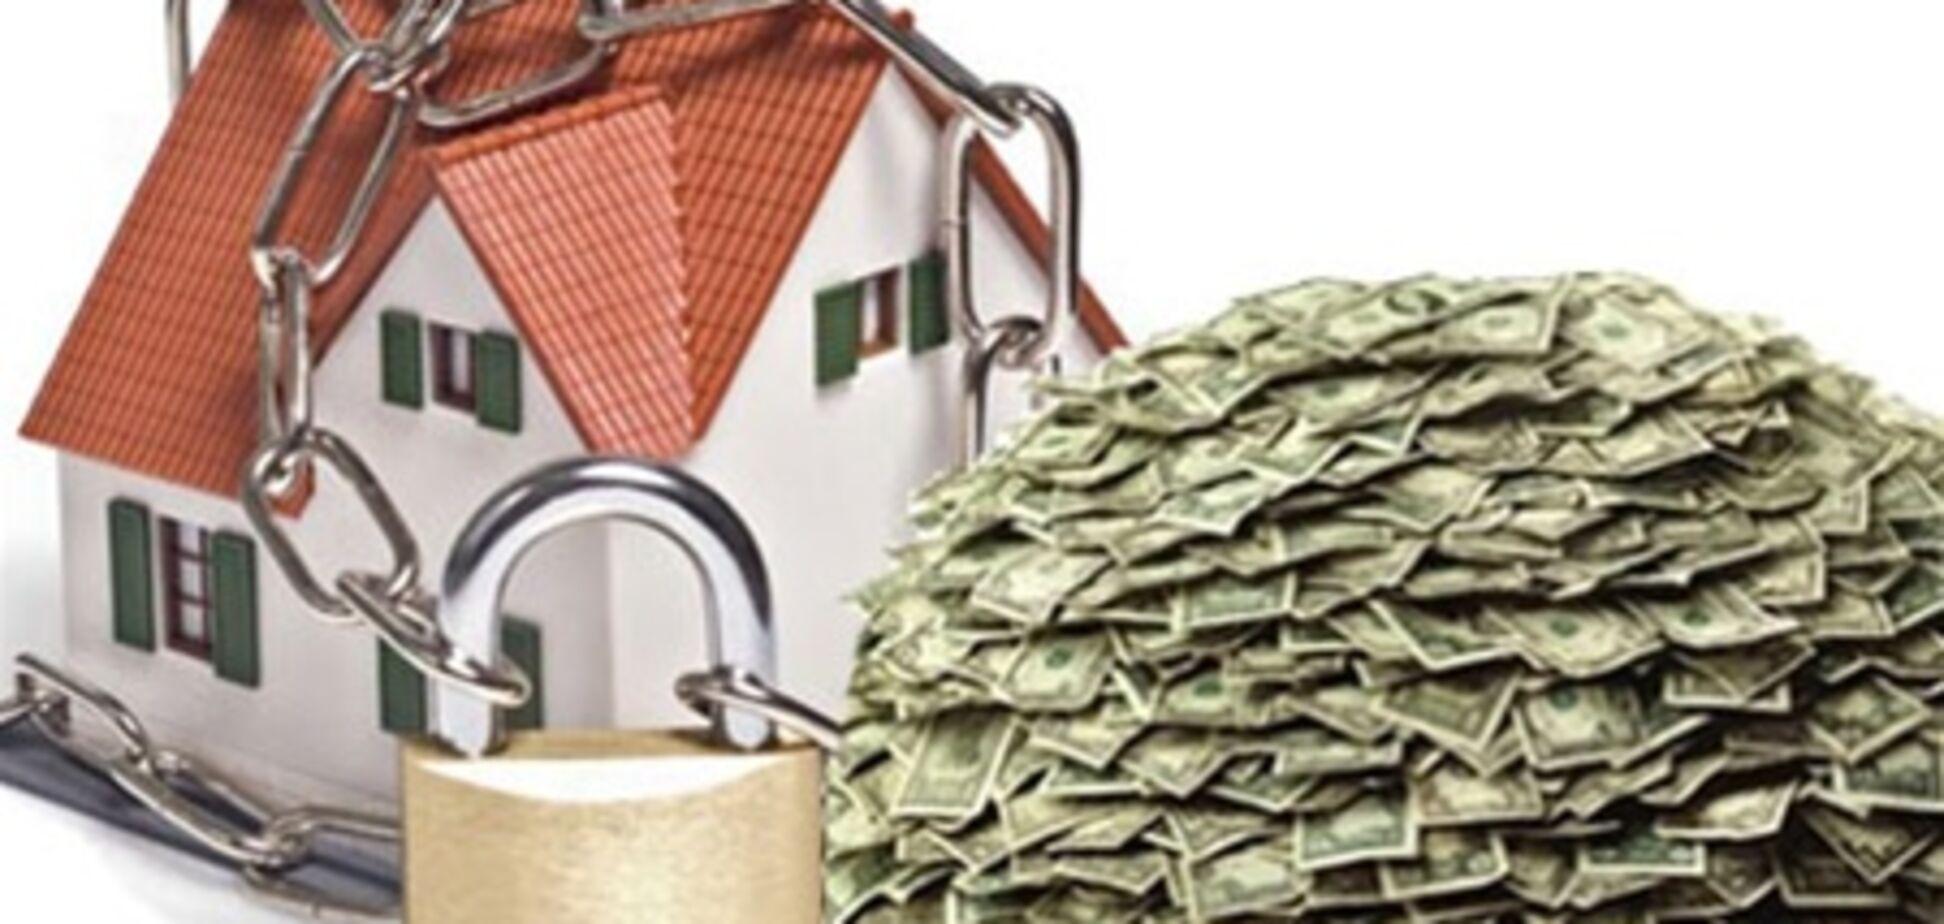 Украинцев защитят от ареста заложенной недвижимости